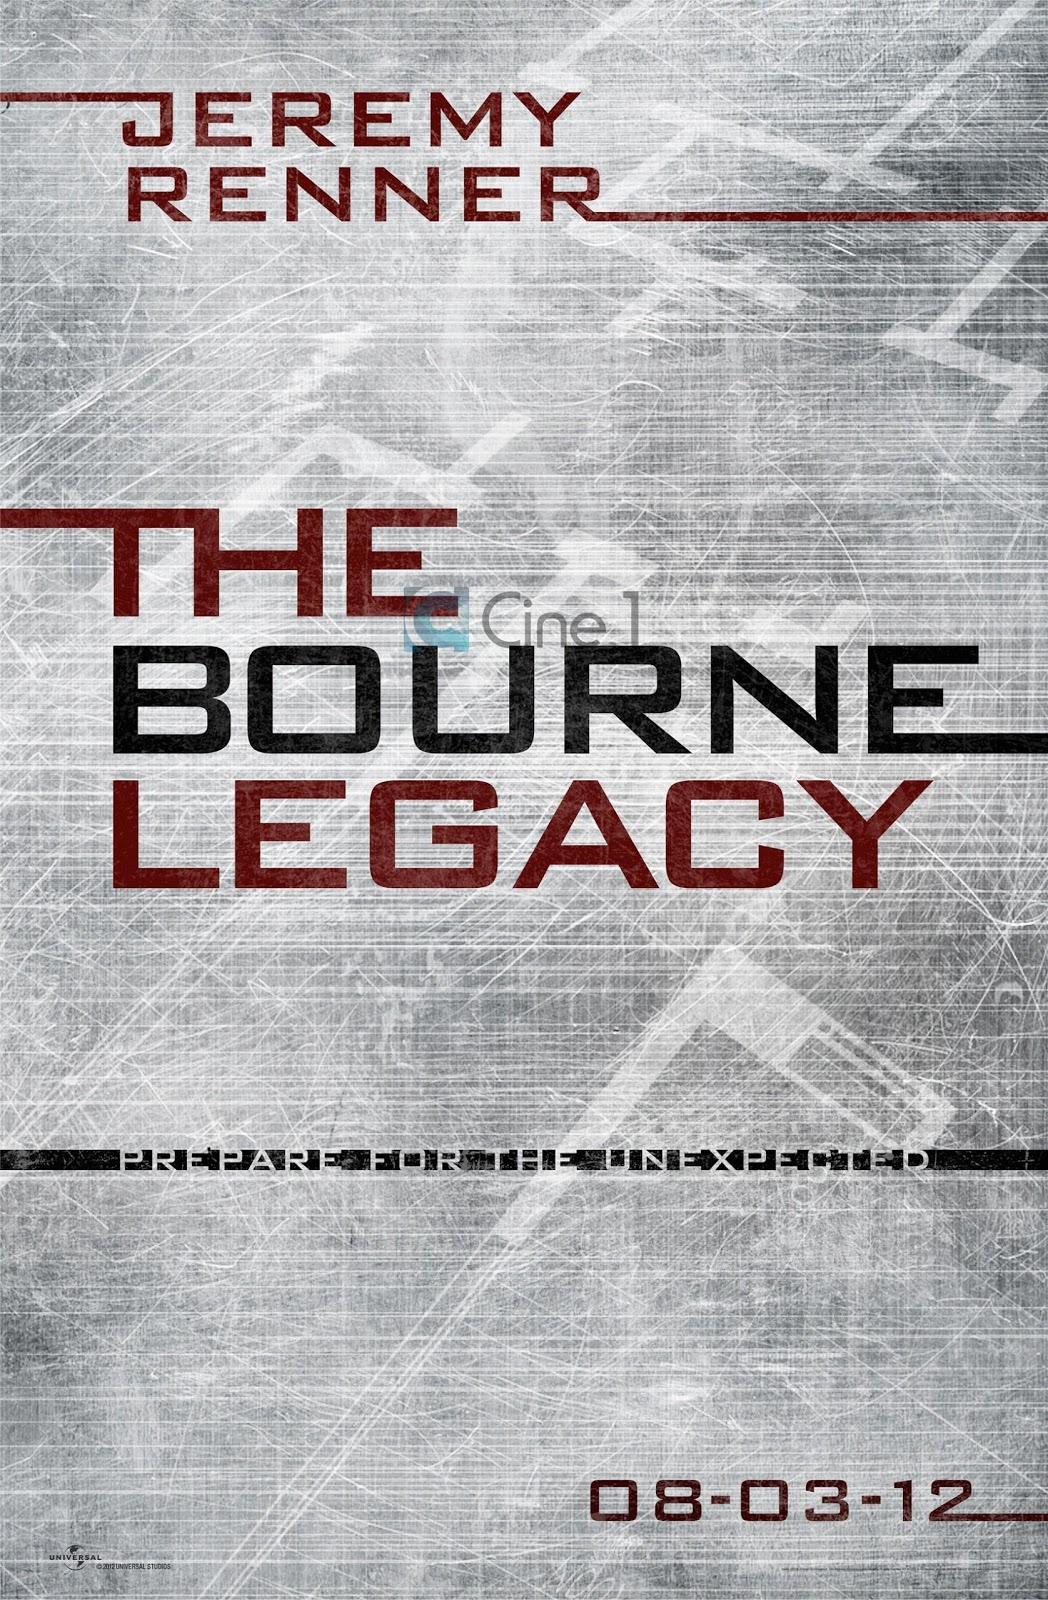 http://3.bp.blogspot.com/-sFFRRxft1YE/TxLGH6OB6mI/AAAAAAAABpw/_mEUvXaLLt8/s1600/solitario-express-poster-the-bourne-legacy-no-L-WNLhJ9.jpeg